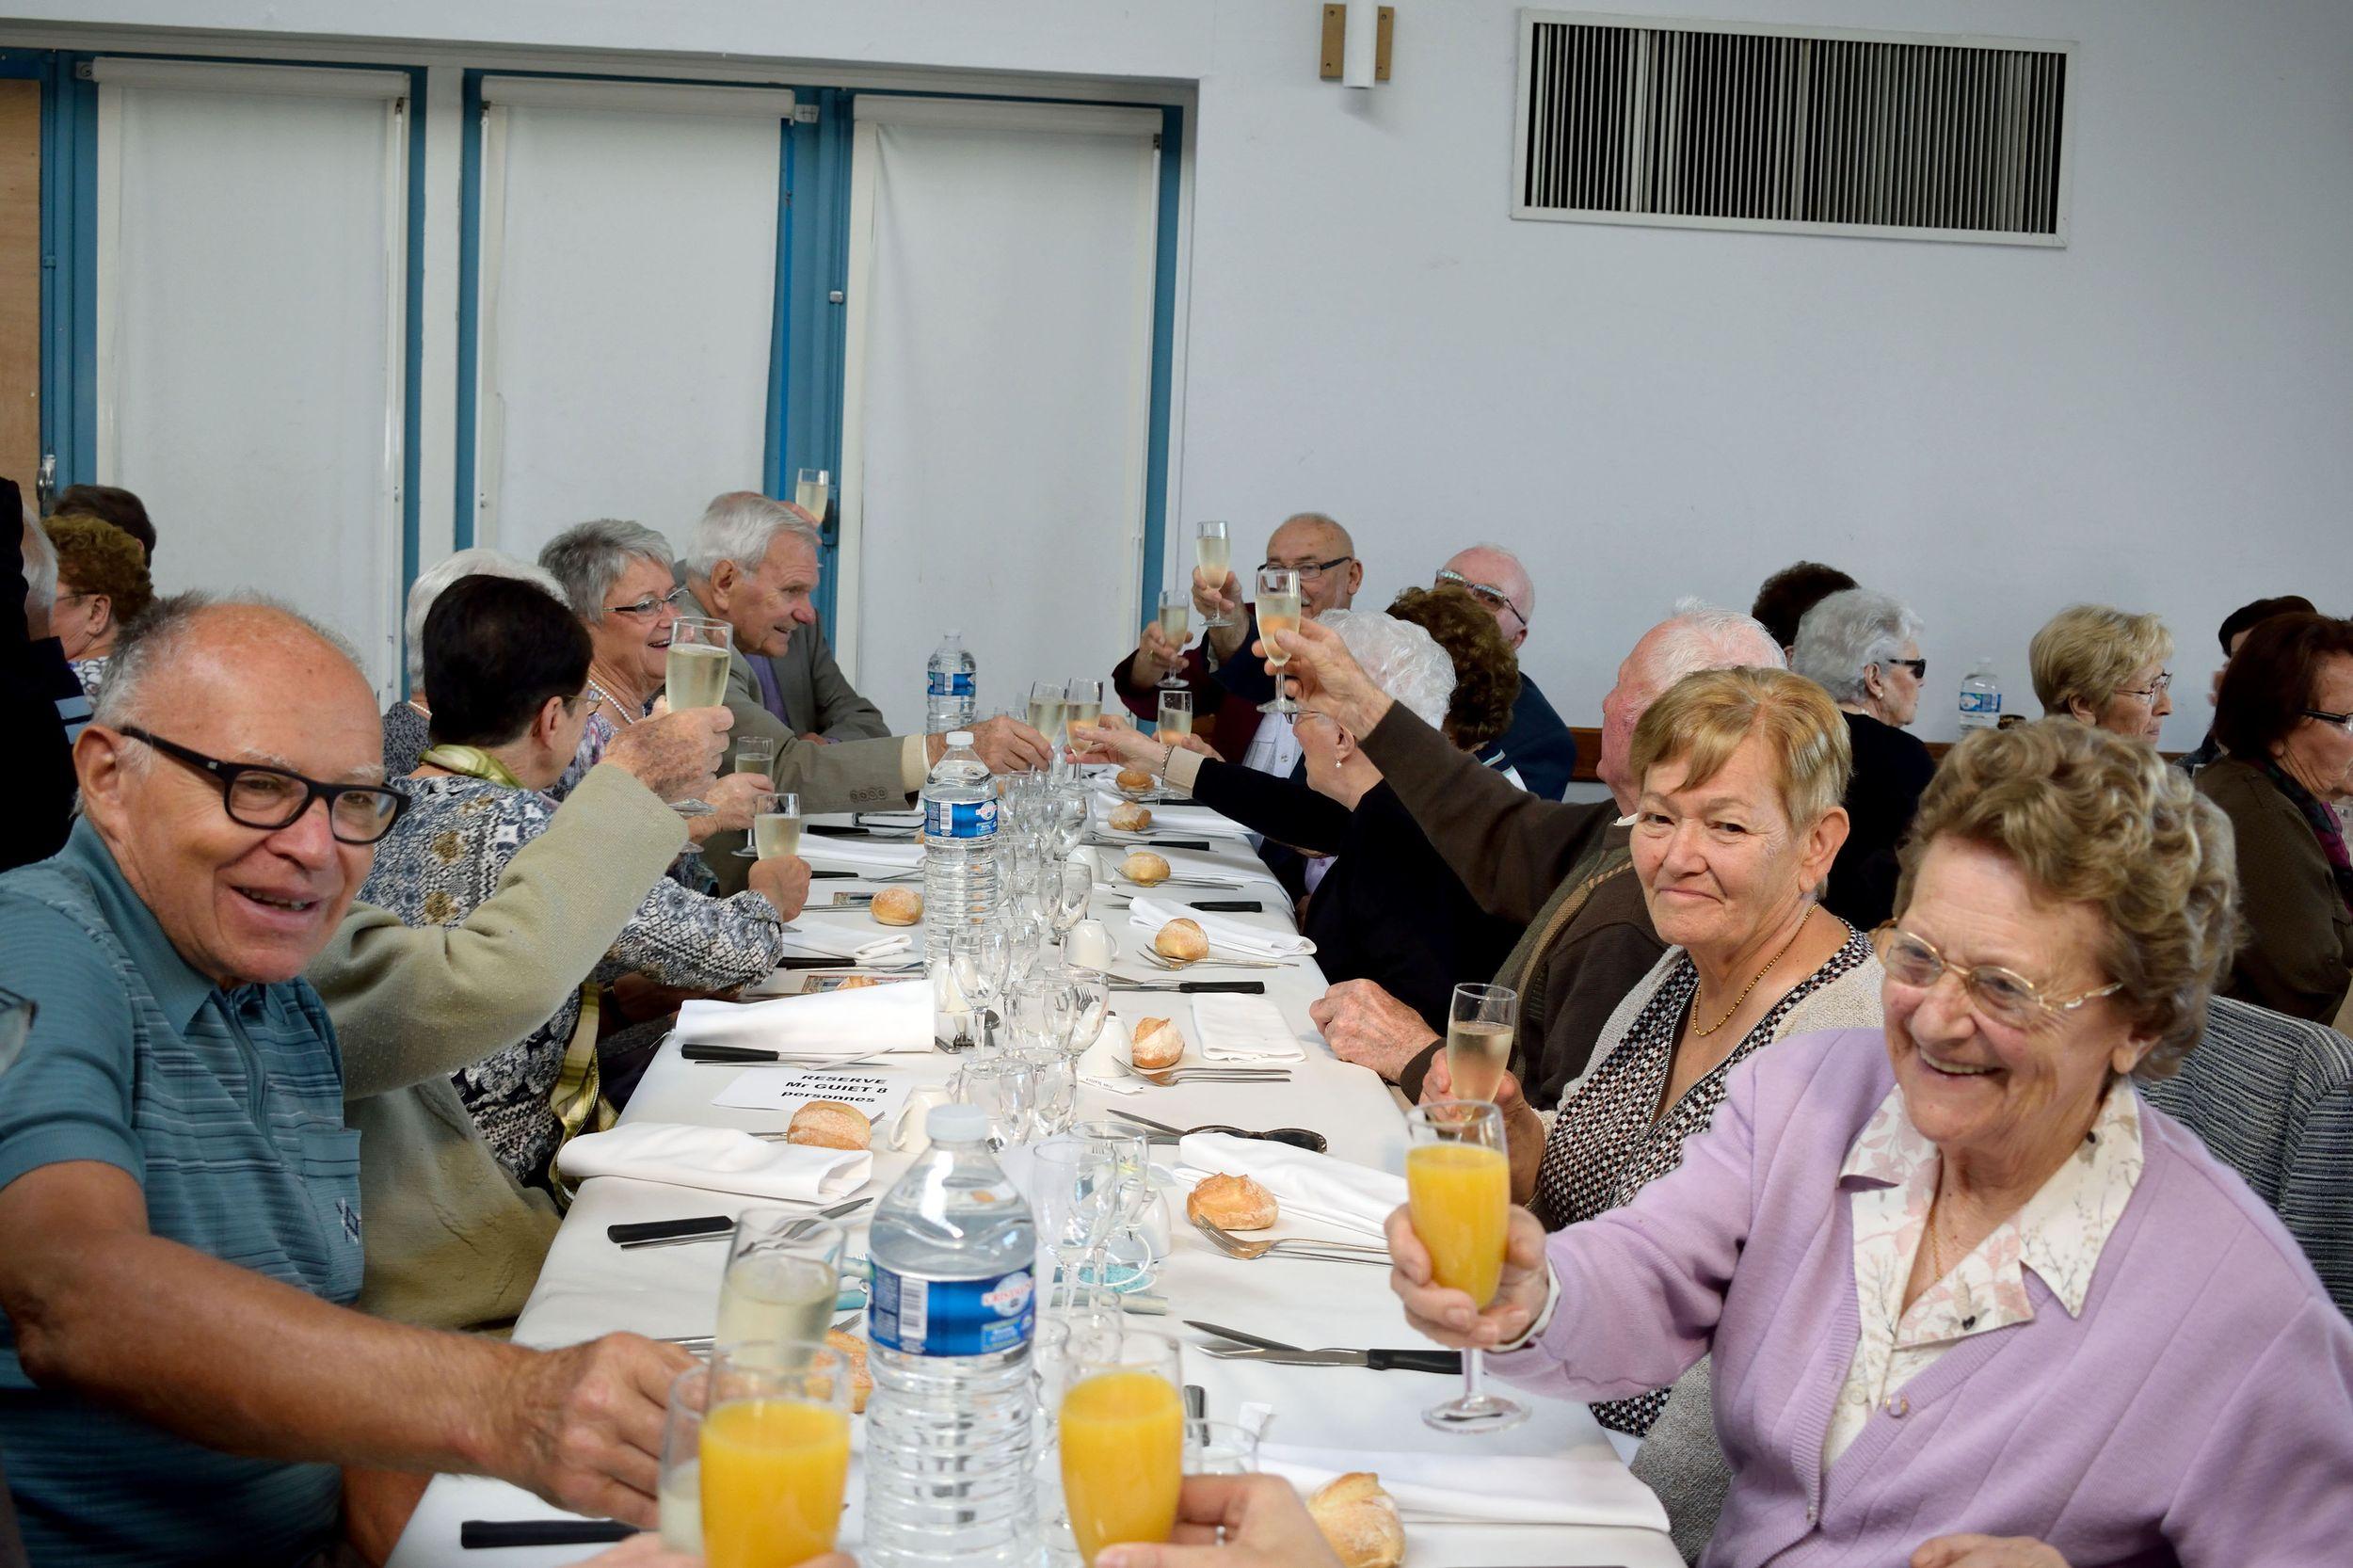 http://www.thouare.fr/wp-content/uploads/2016/10/Diaporama11_Repas_seniors.jpg